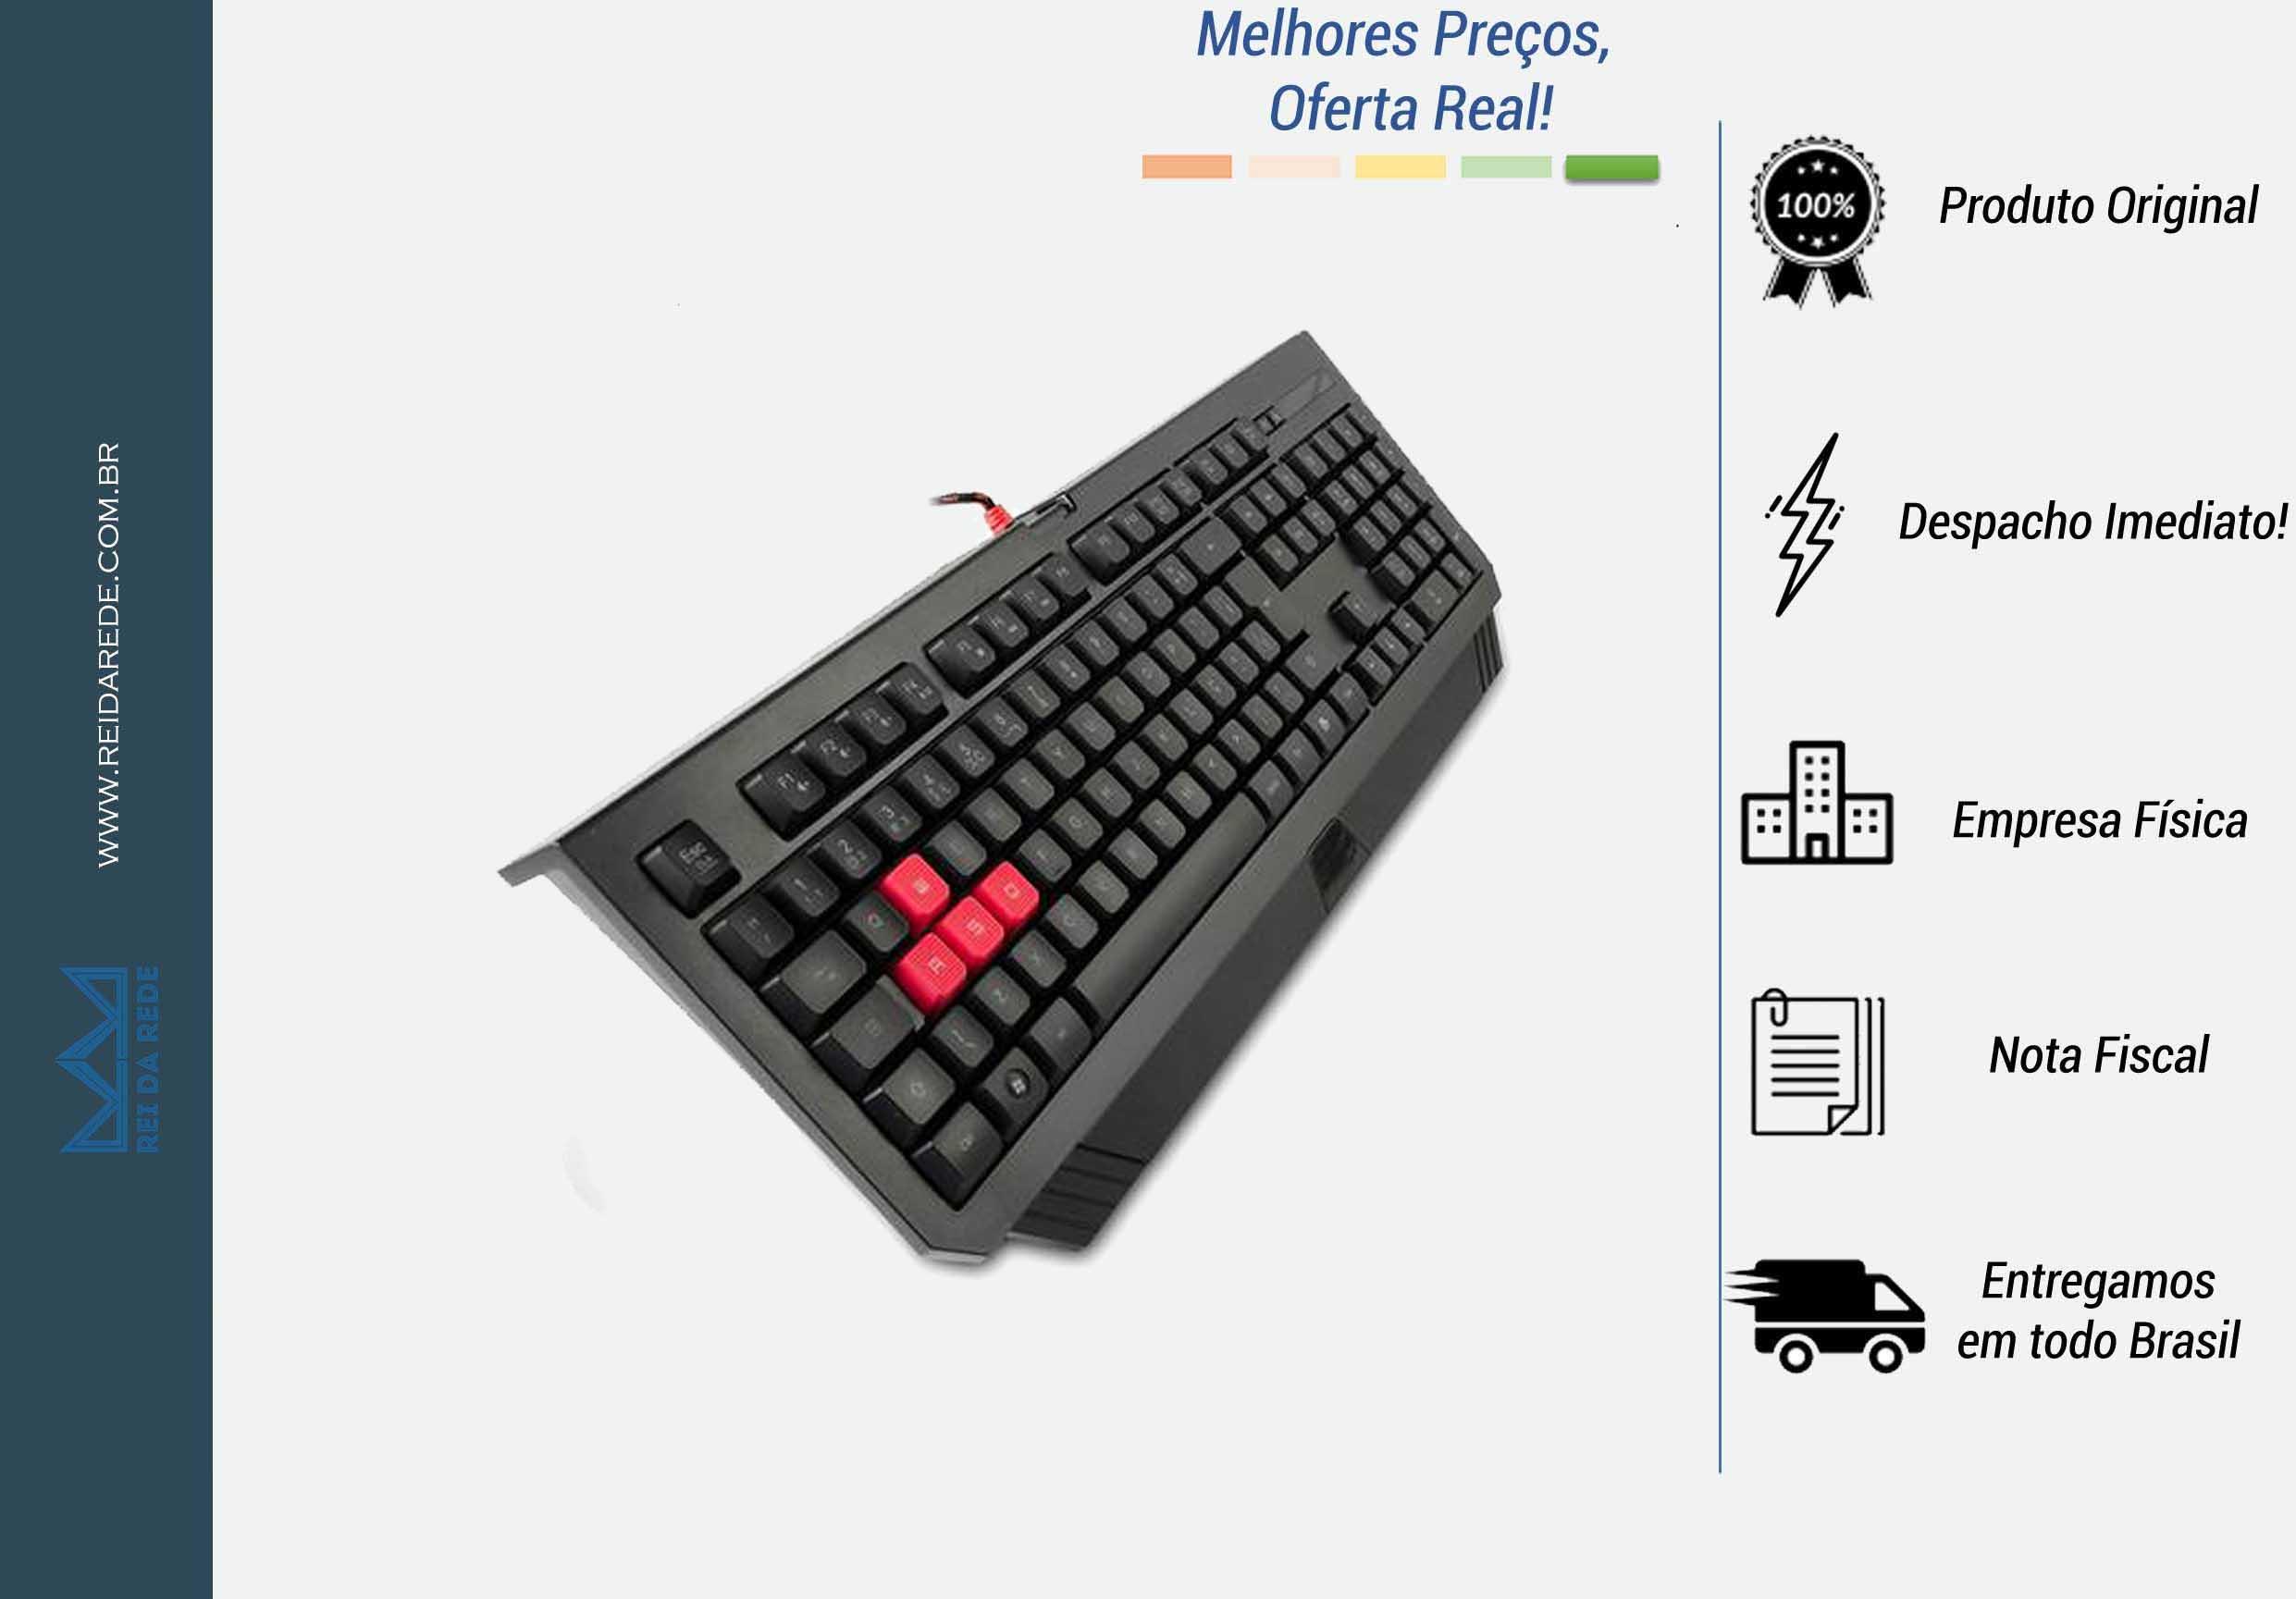 TECLADO USB GAME BLOODY TURBO TECLAS ANTI-GHOST B120 PRETO A4T